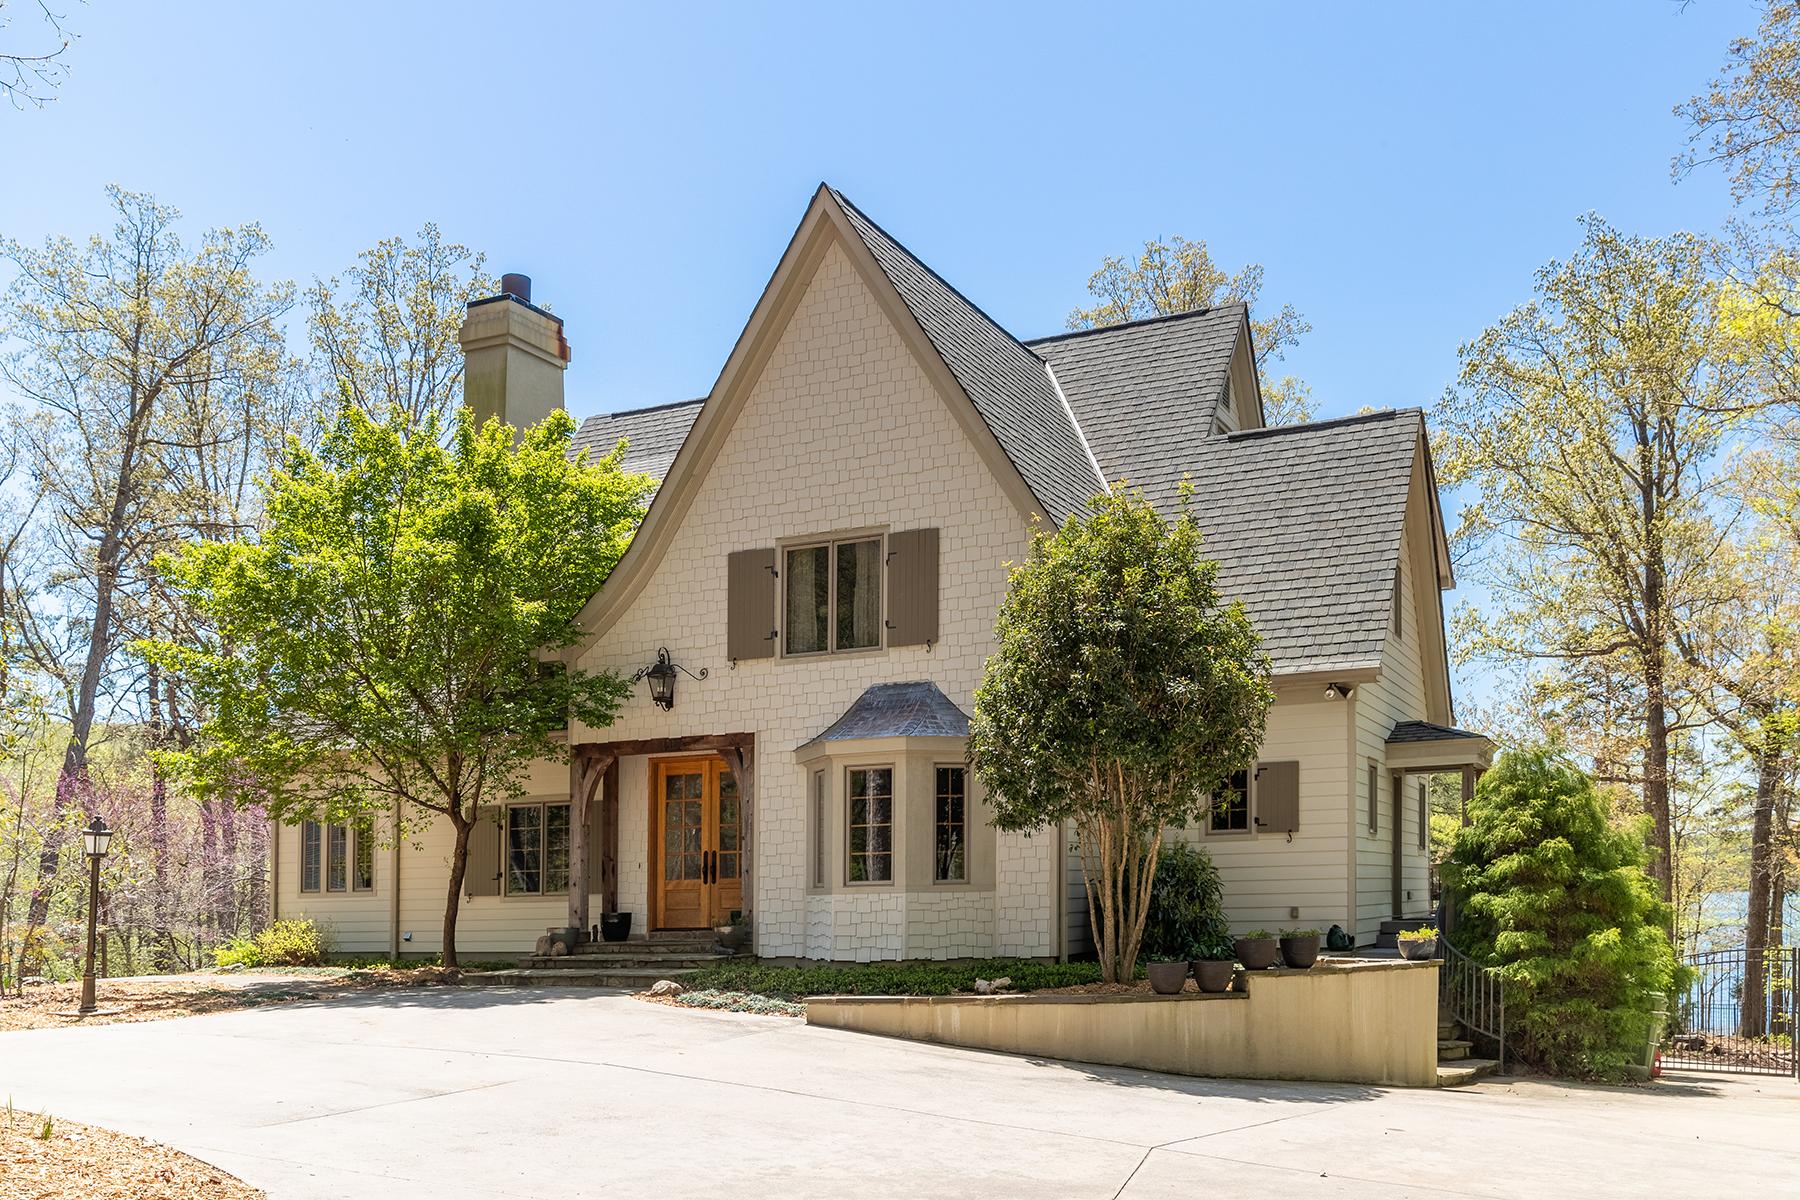 Single Family Homes για την Πώληση στο 118 Kingfisher Ct, Lexington, Βορεια Καρολινα 27292 Ηνωμένες Πολιτείες